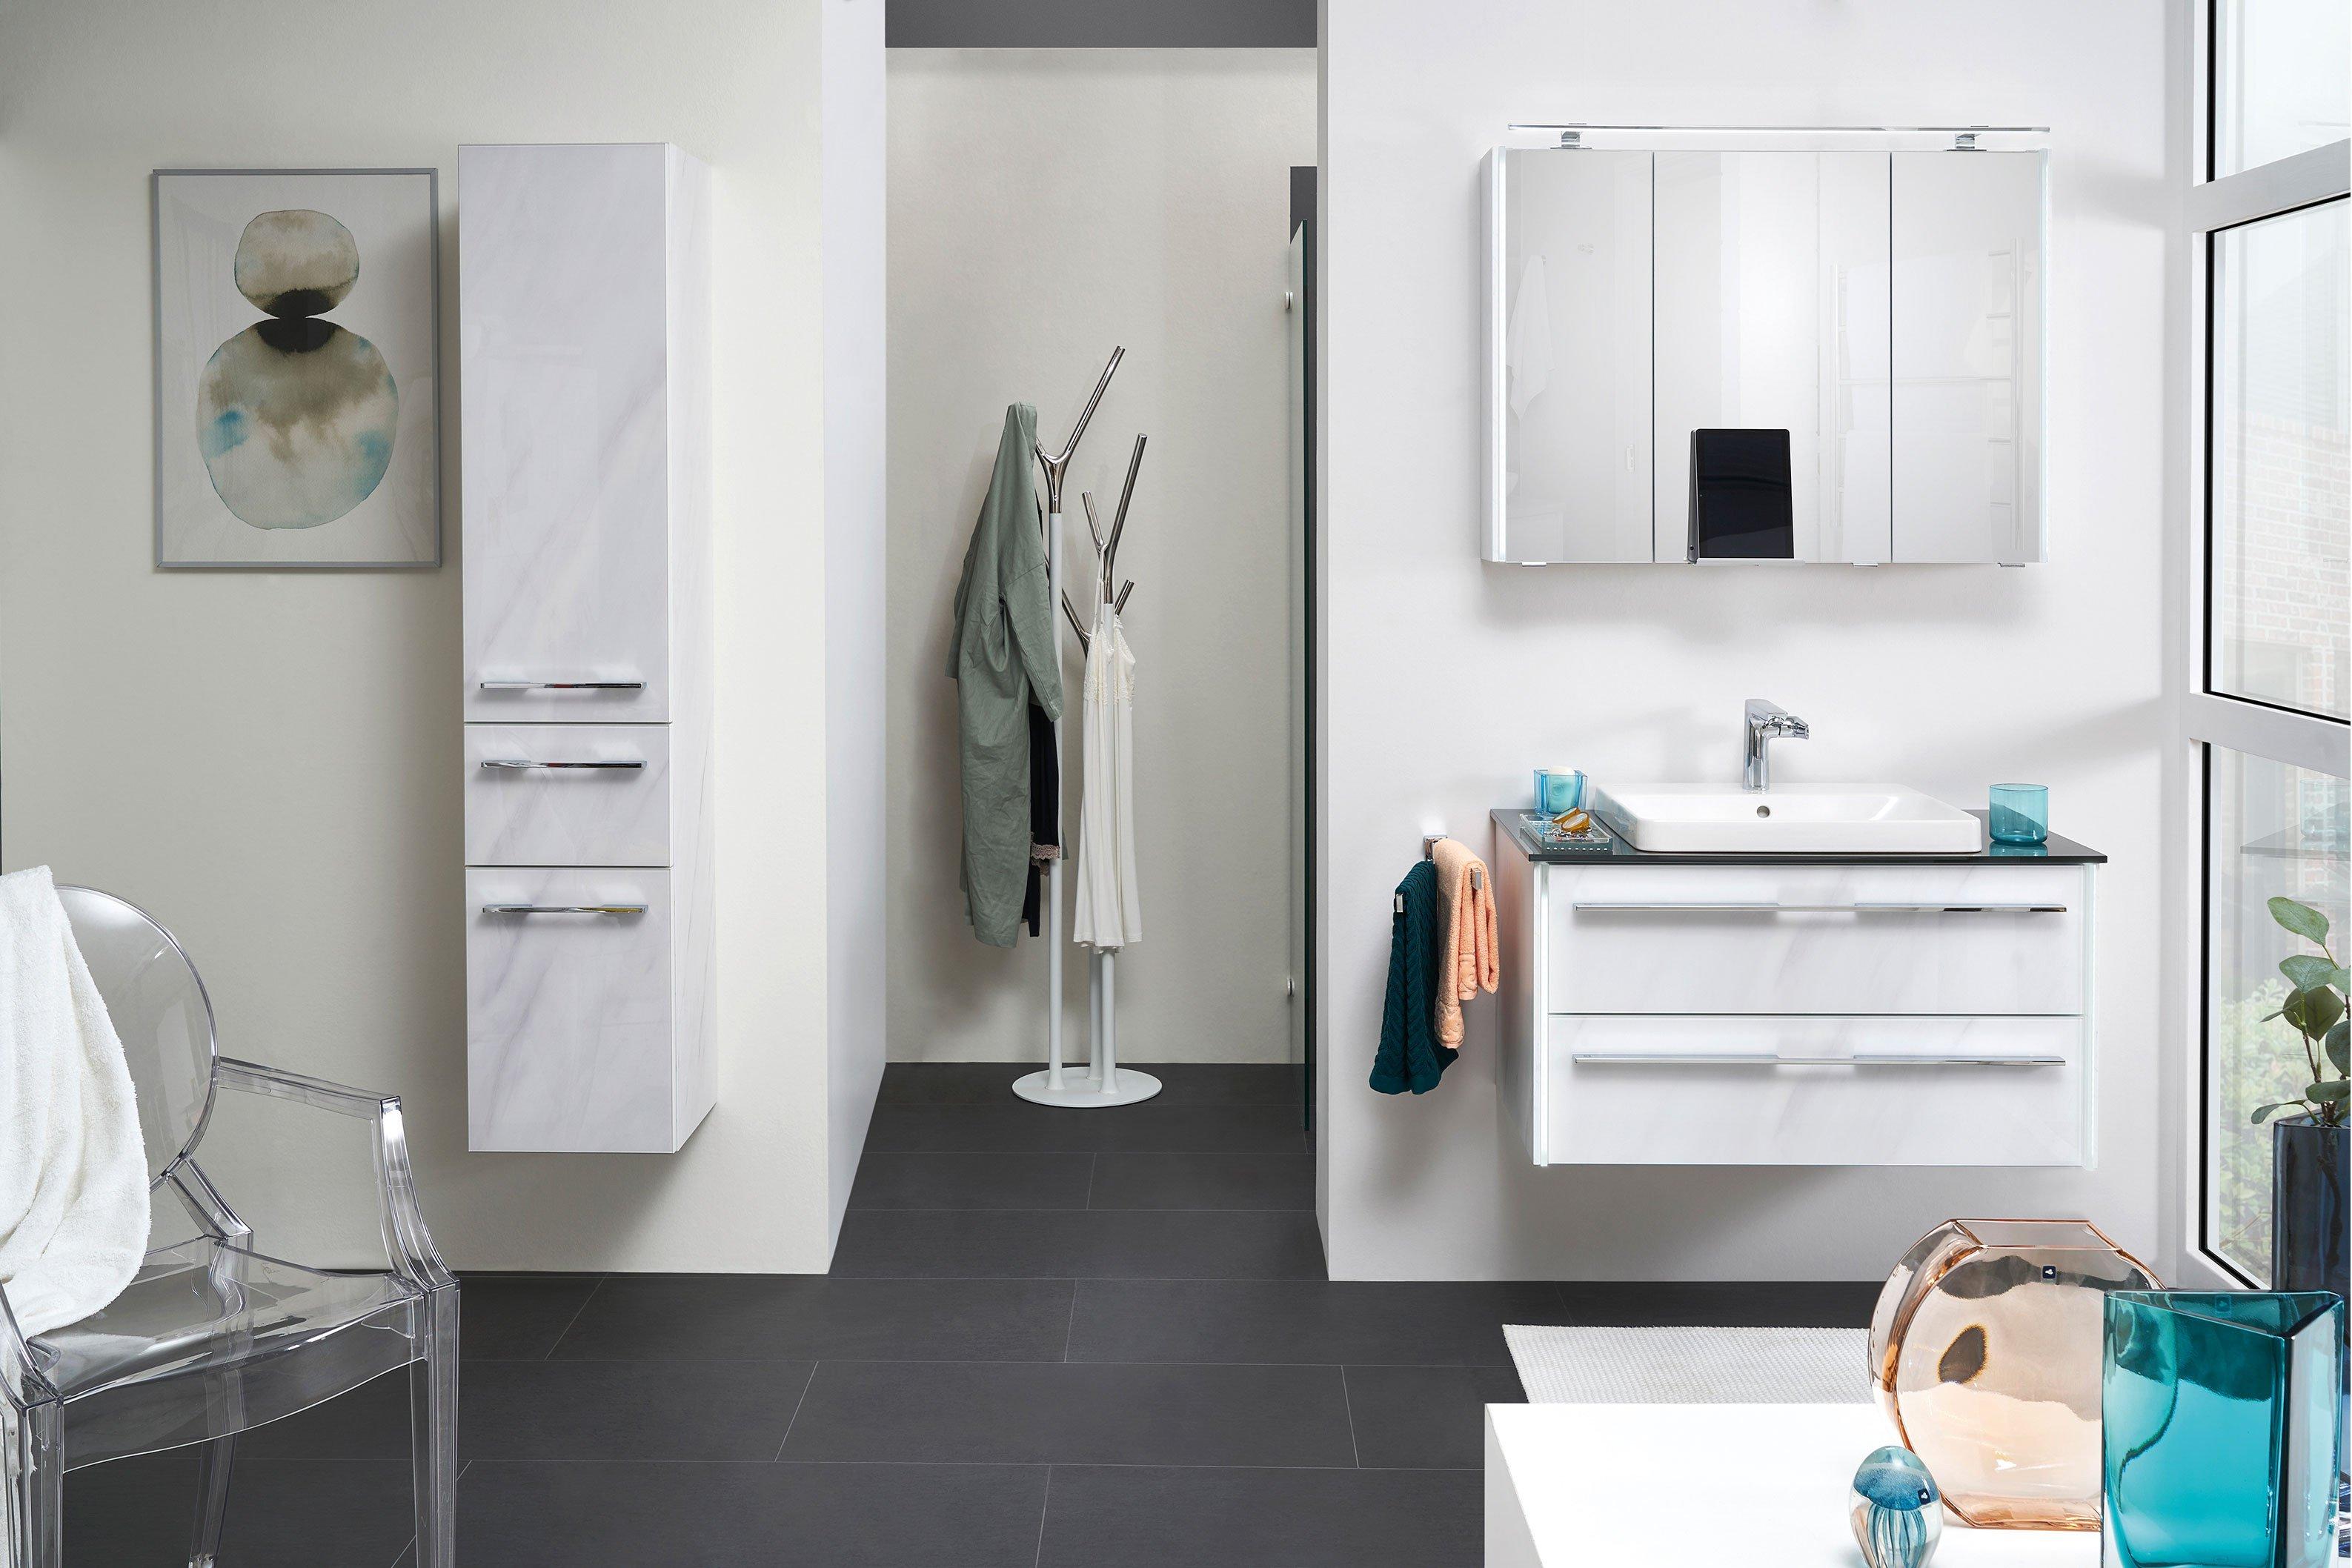 Bad 116 von LEONARDO living - Badezimmer in Glas Marmor